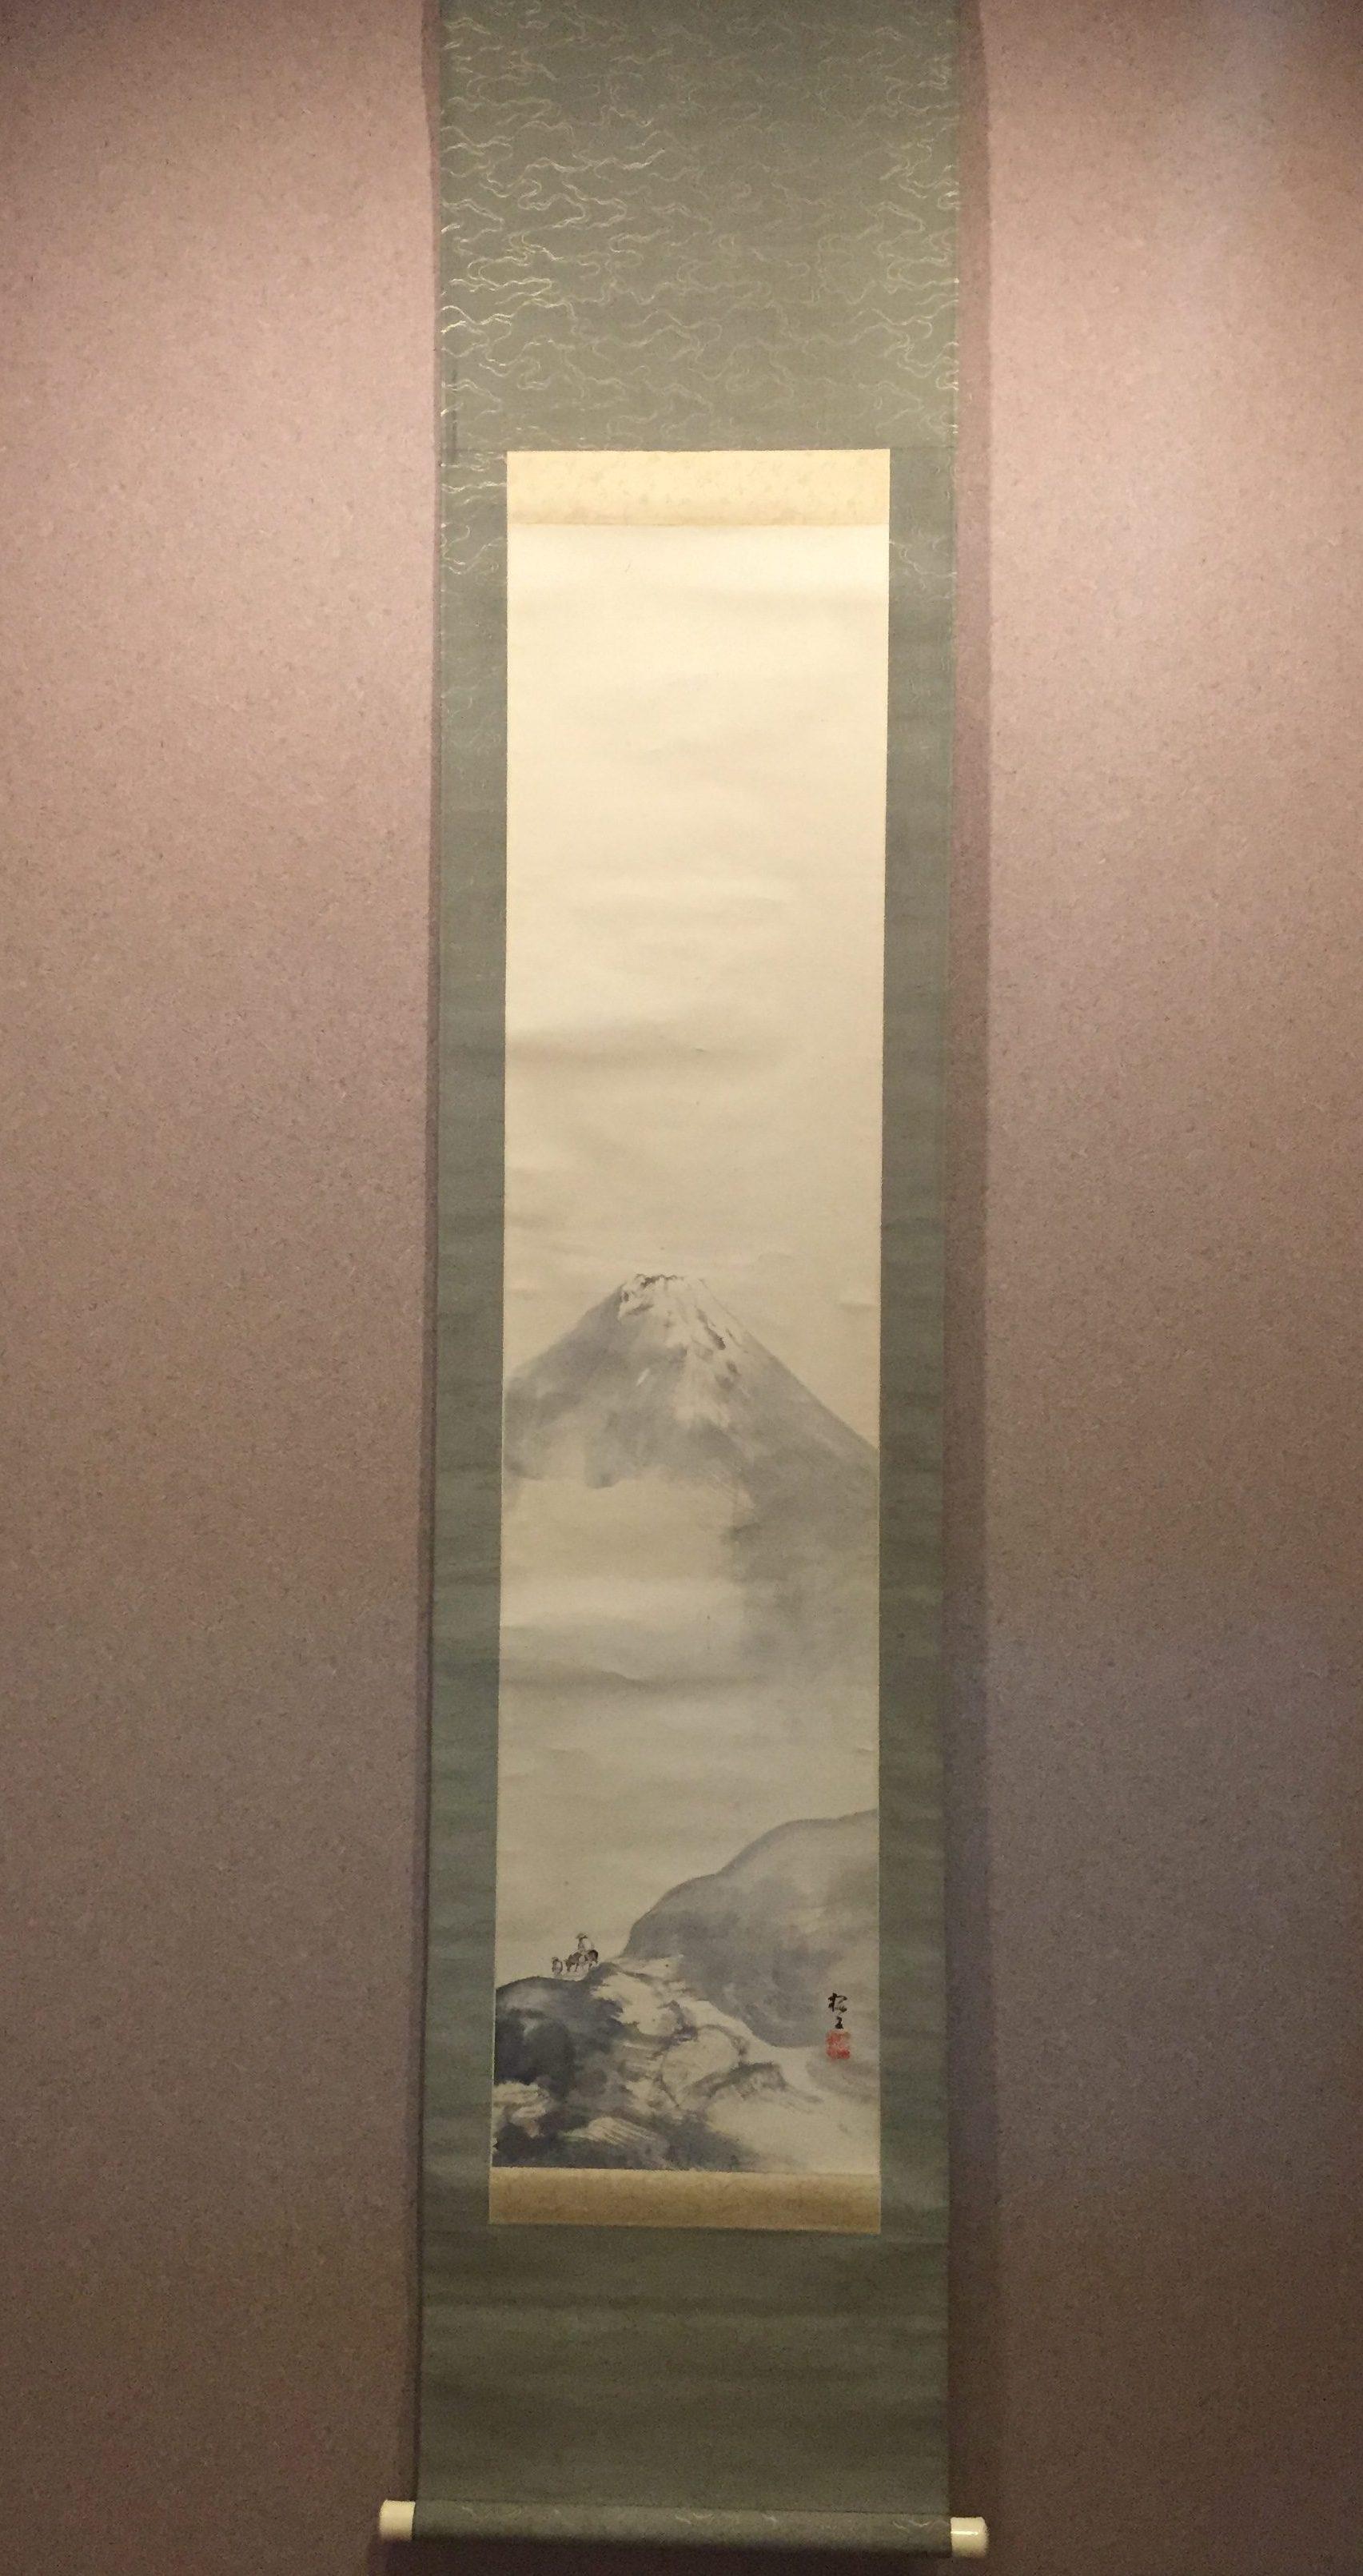 `Fugaku-zu` [Painting of Mt. Fuji] by Konoshima Okoku(木島桜谷)